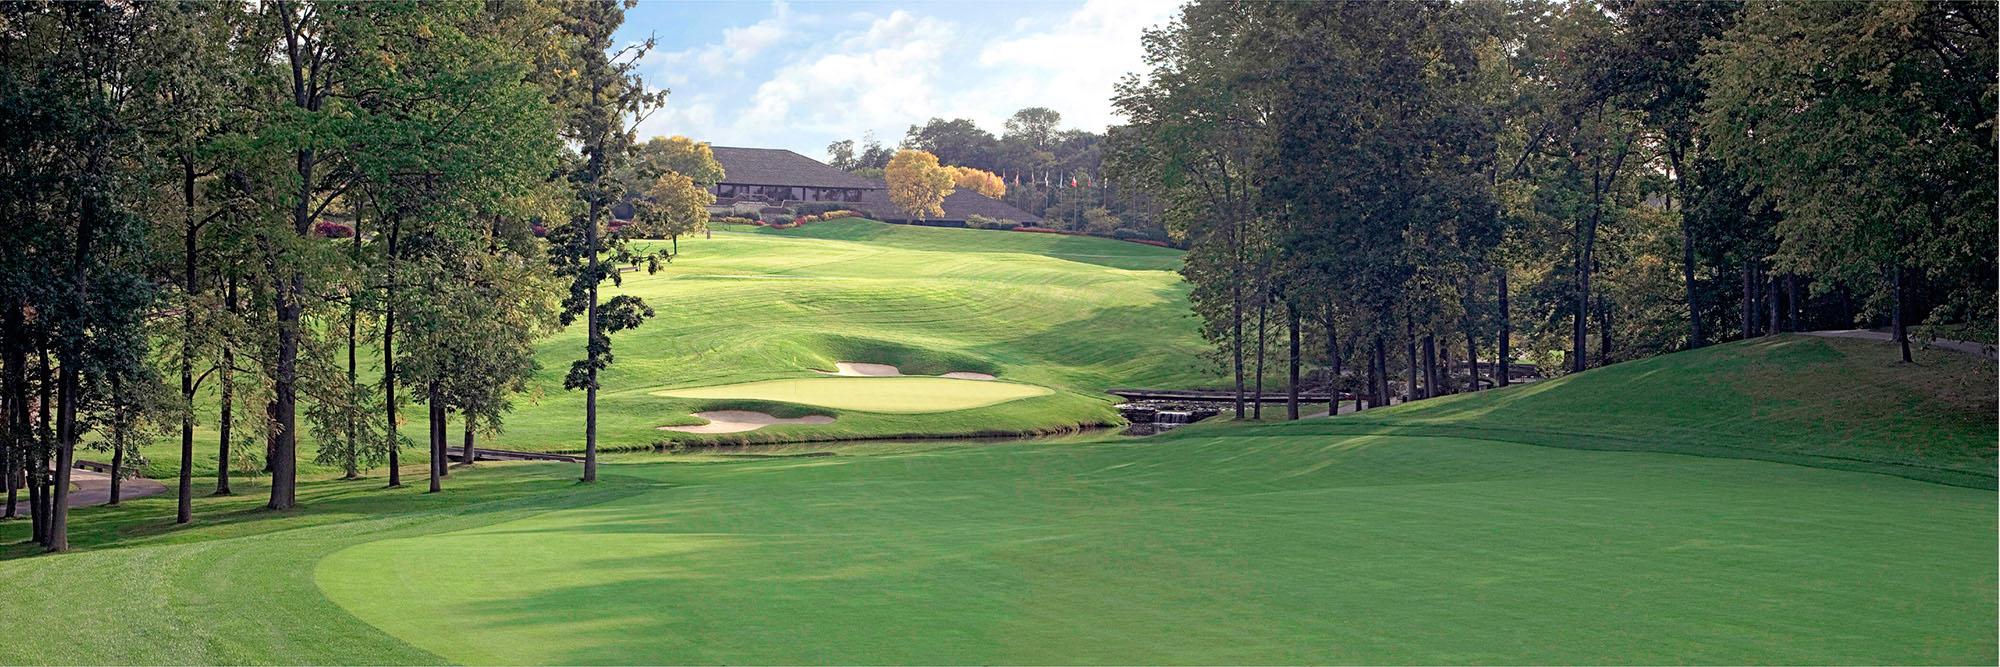 Golf Course Image - Muirfield Village No. 9